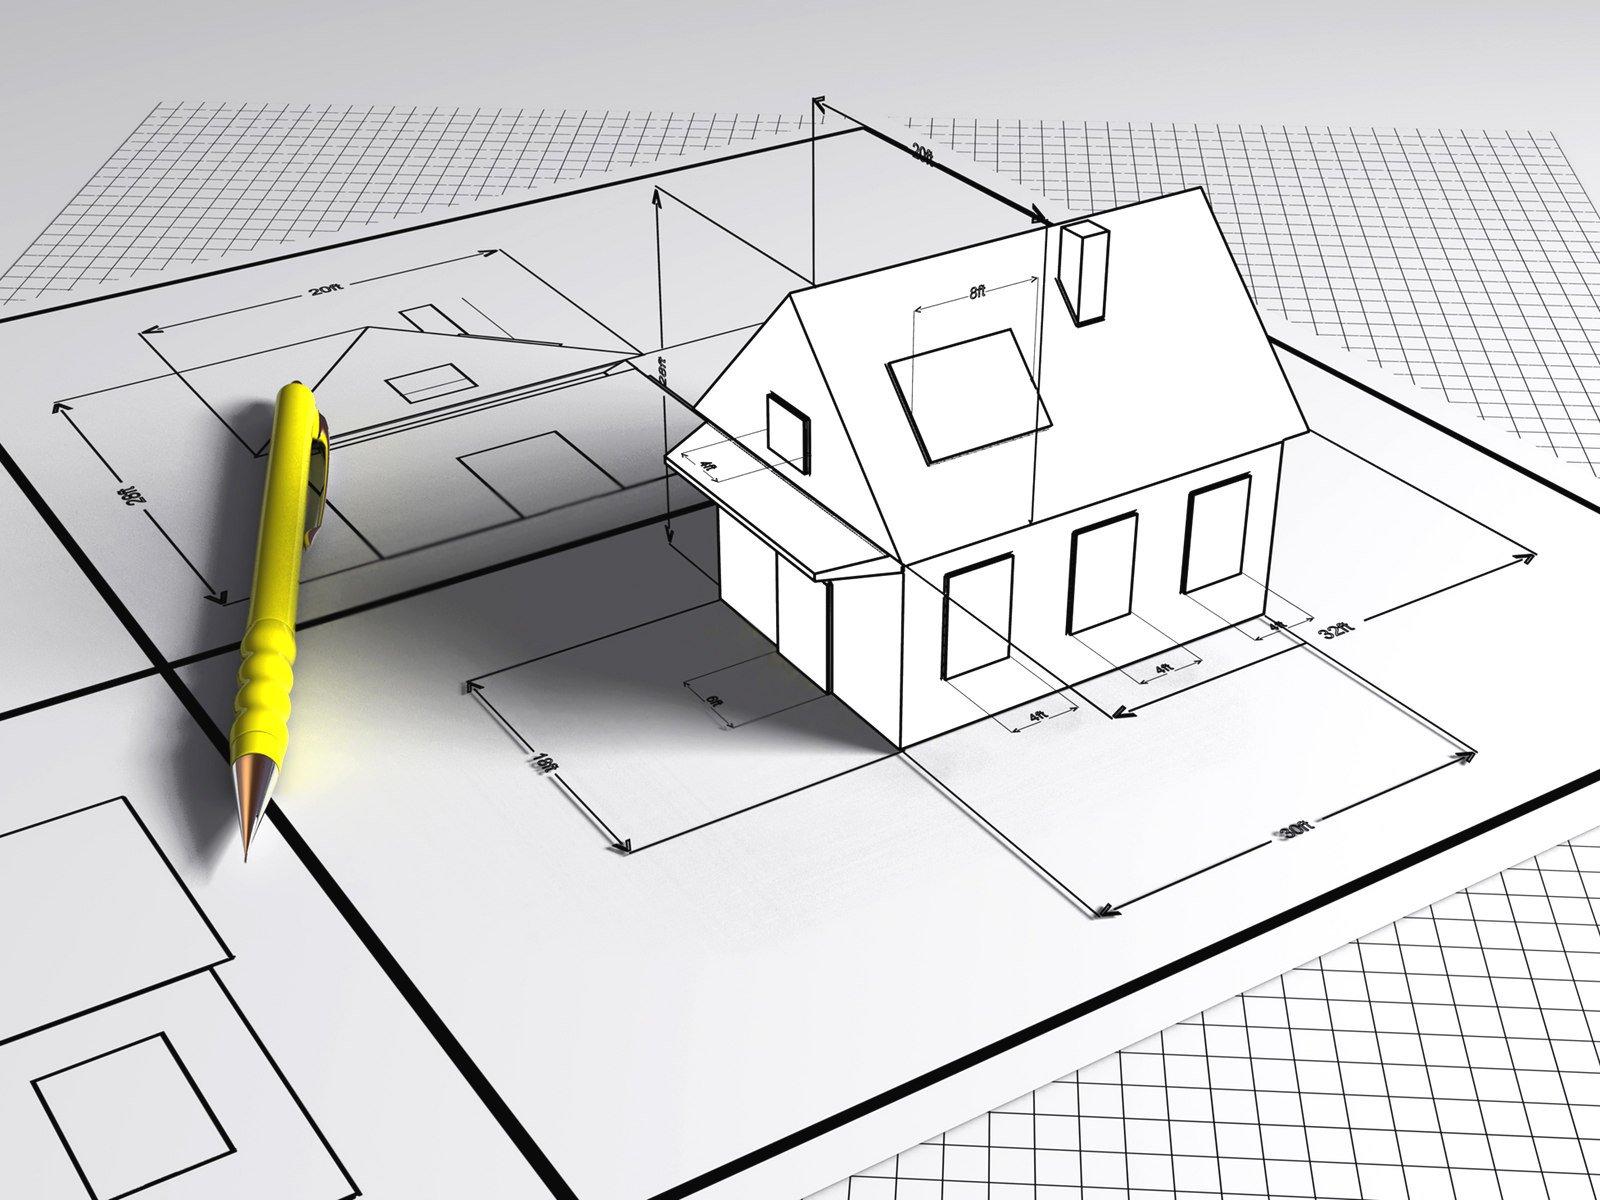 Contemporary Architecture Design And Construction Process Google